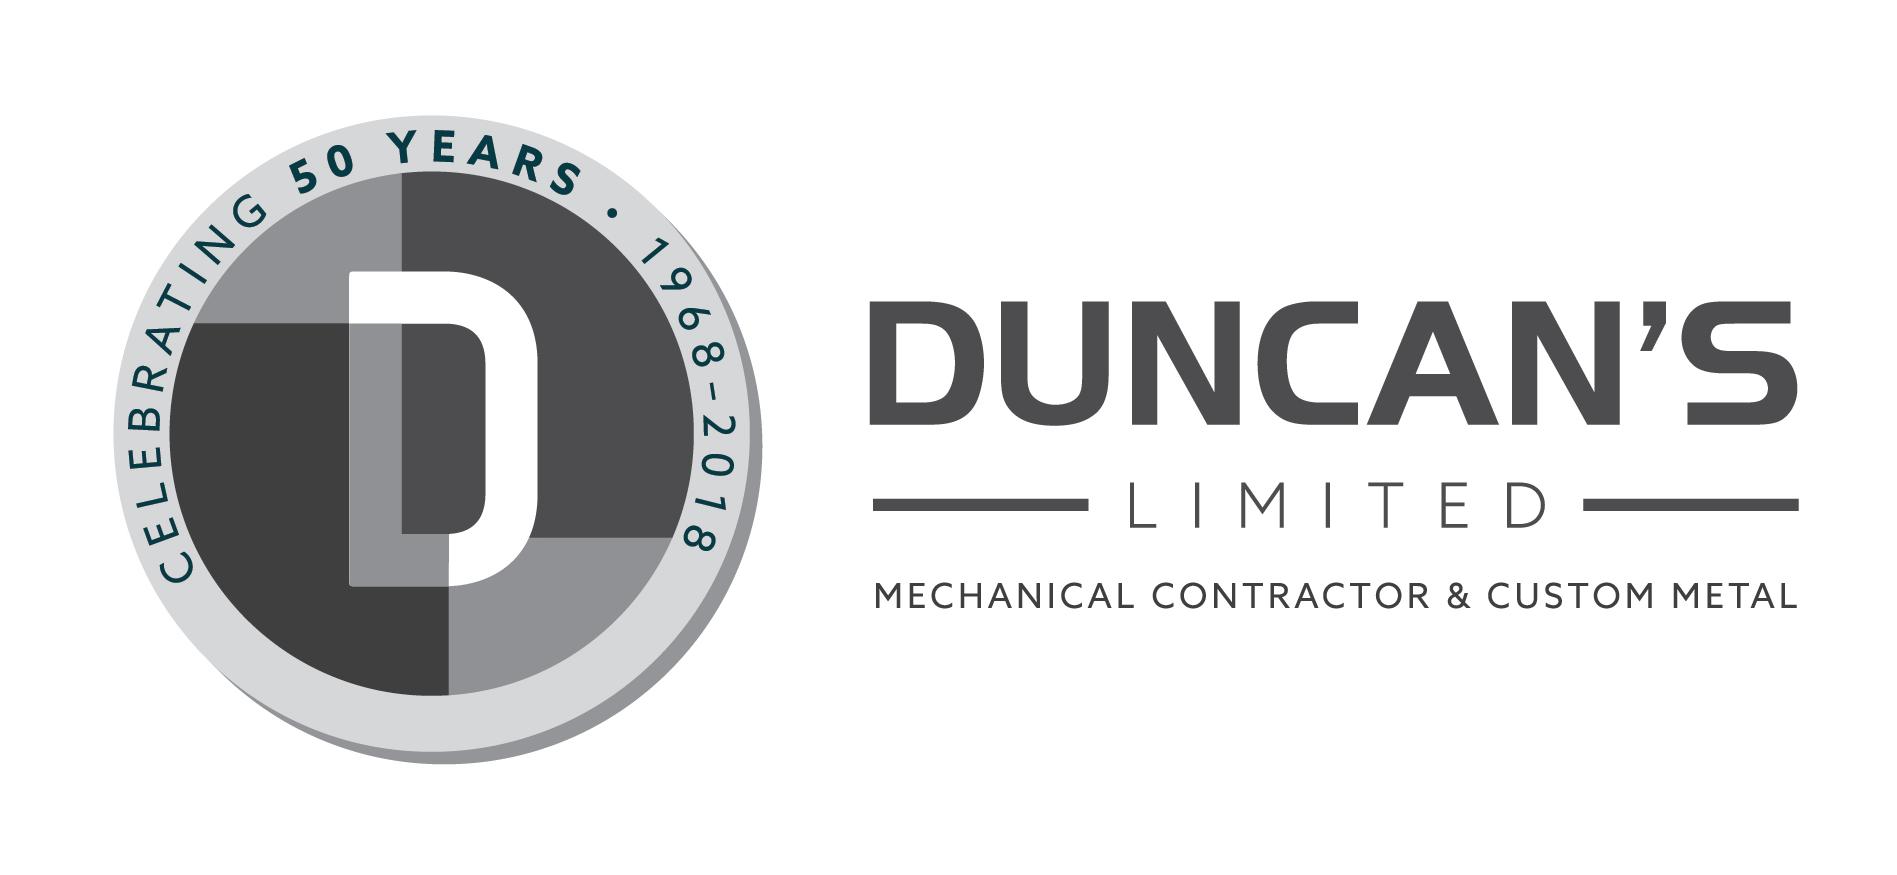 Duncans Limited